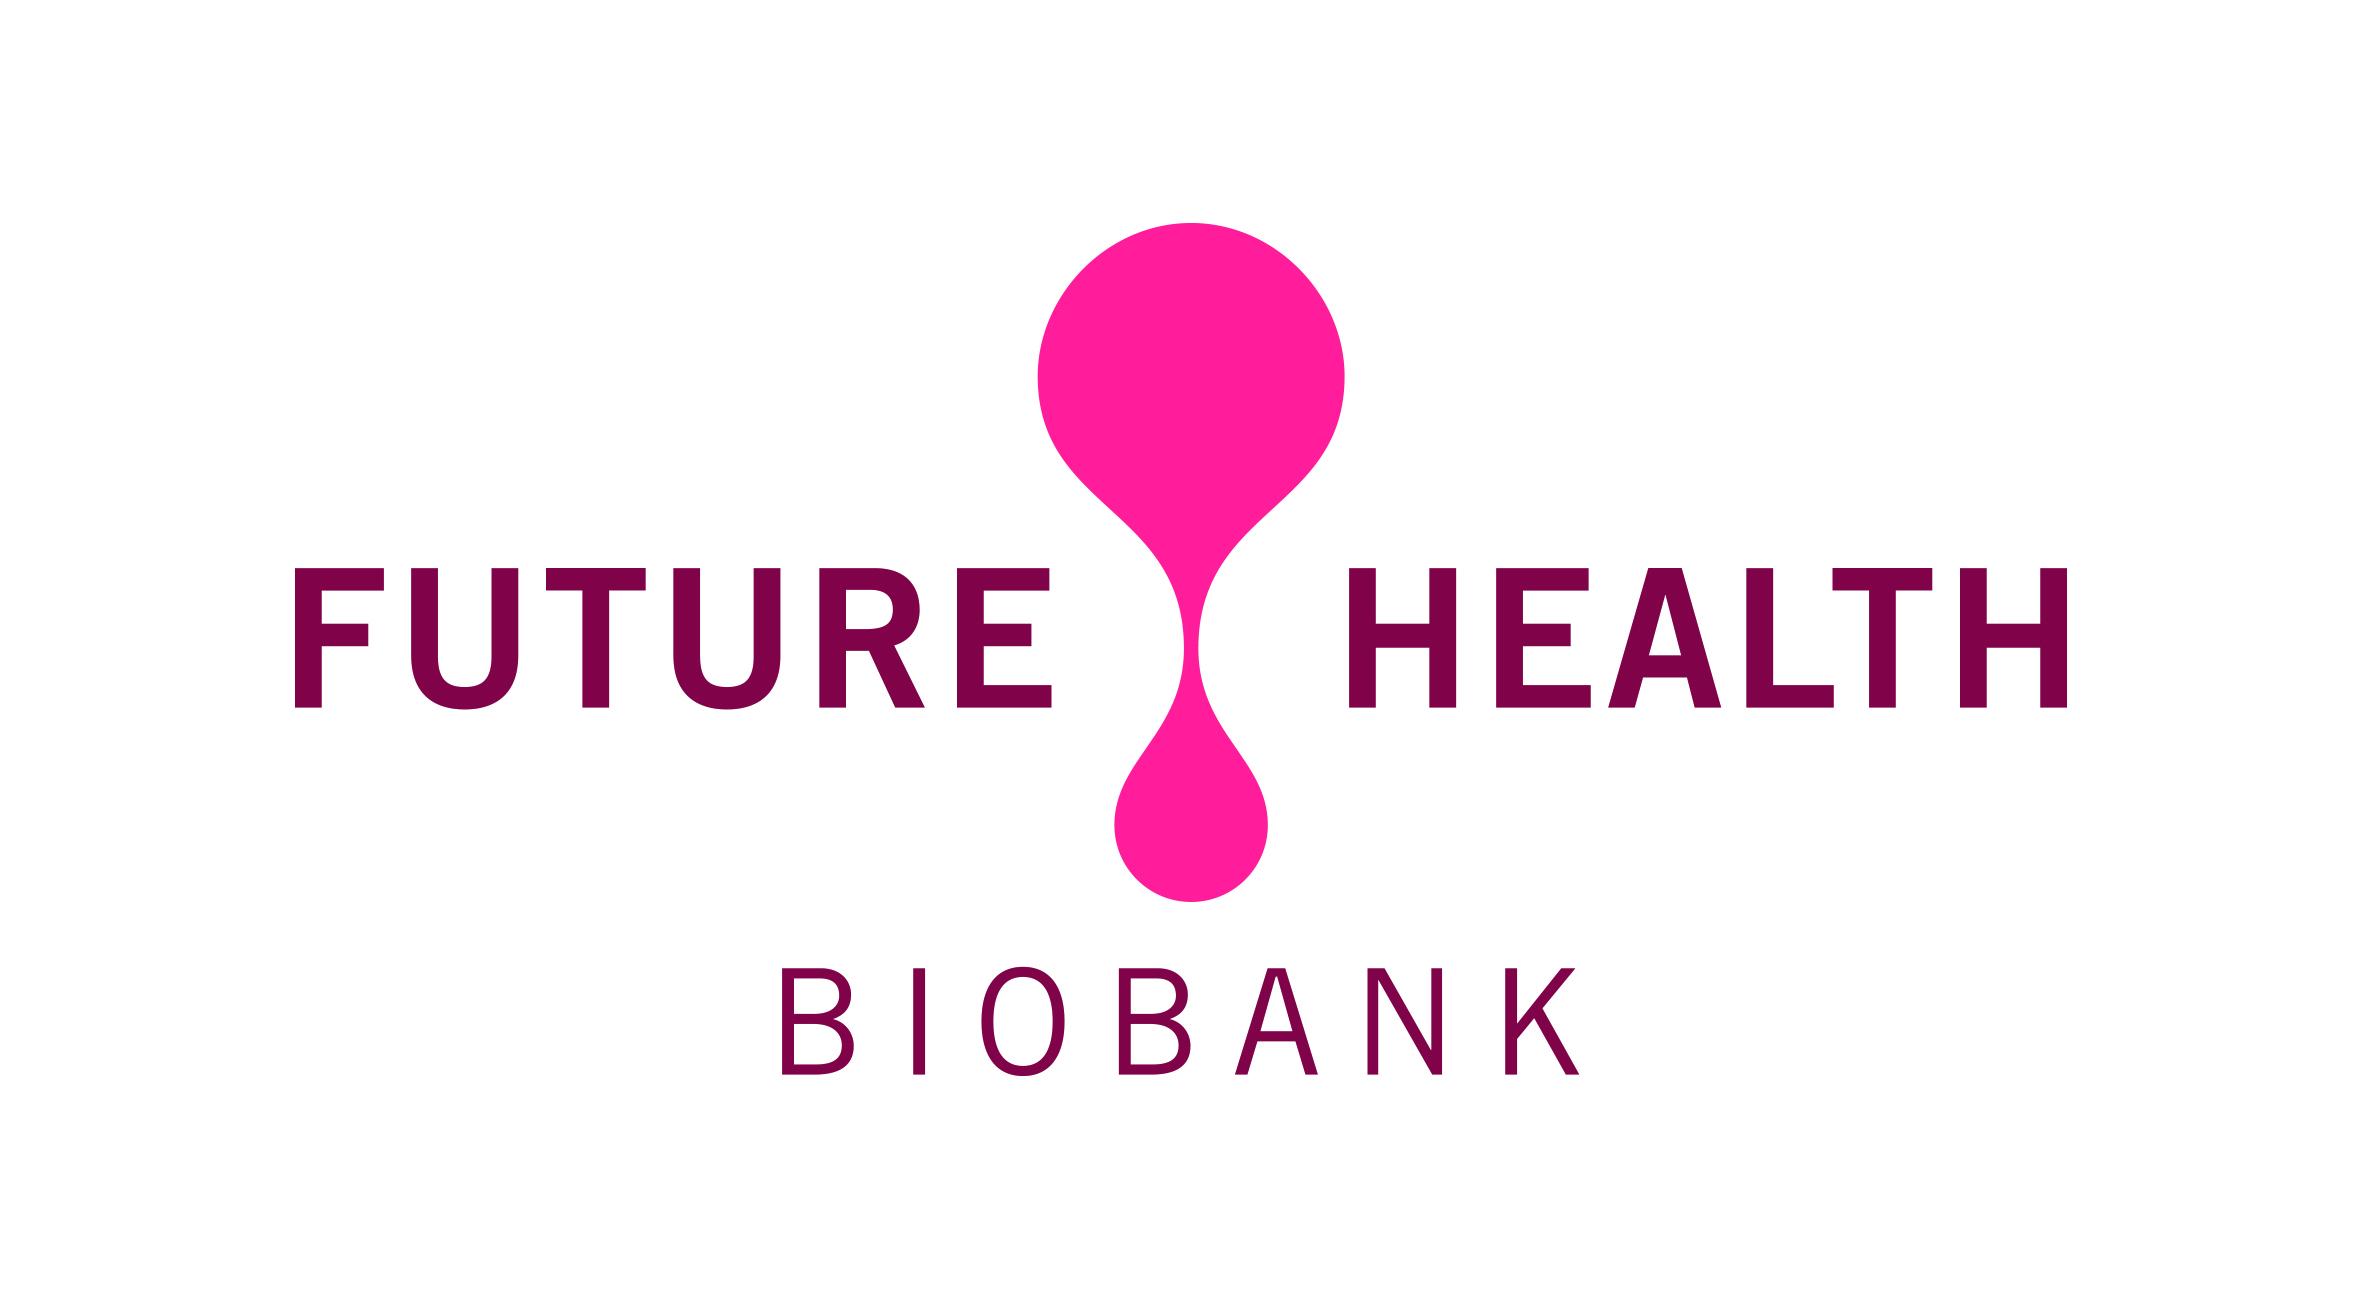 FutureHealthBiobank_CMYK.JPG